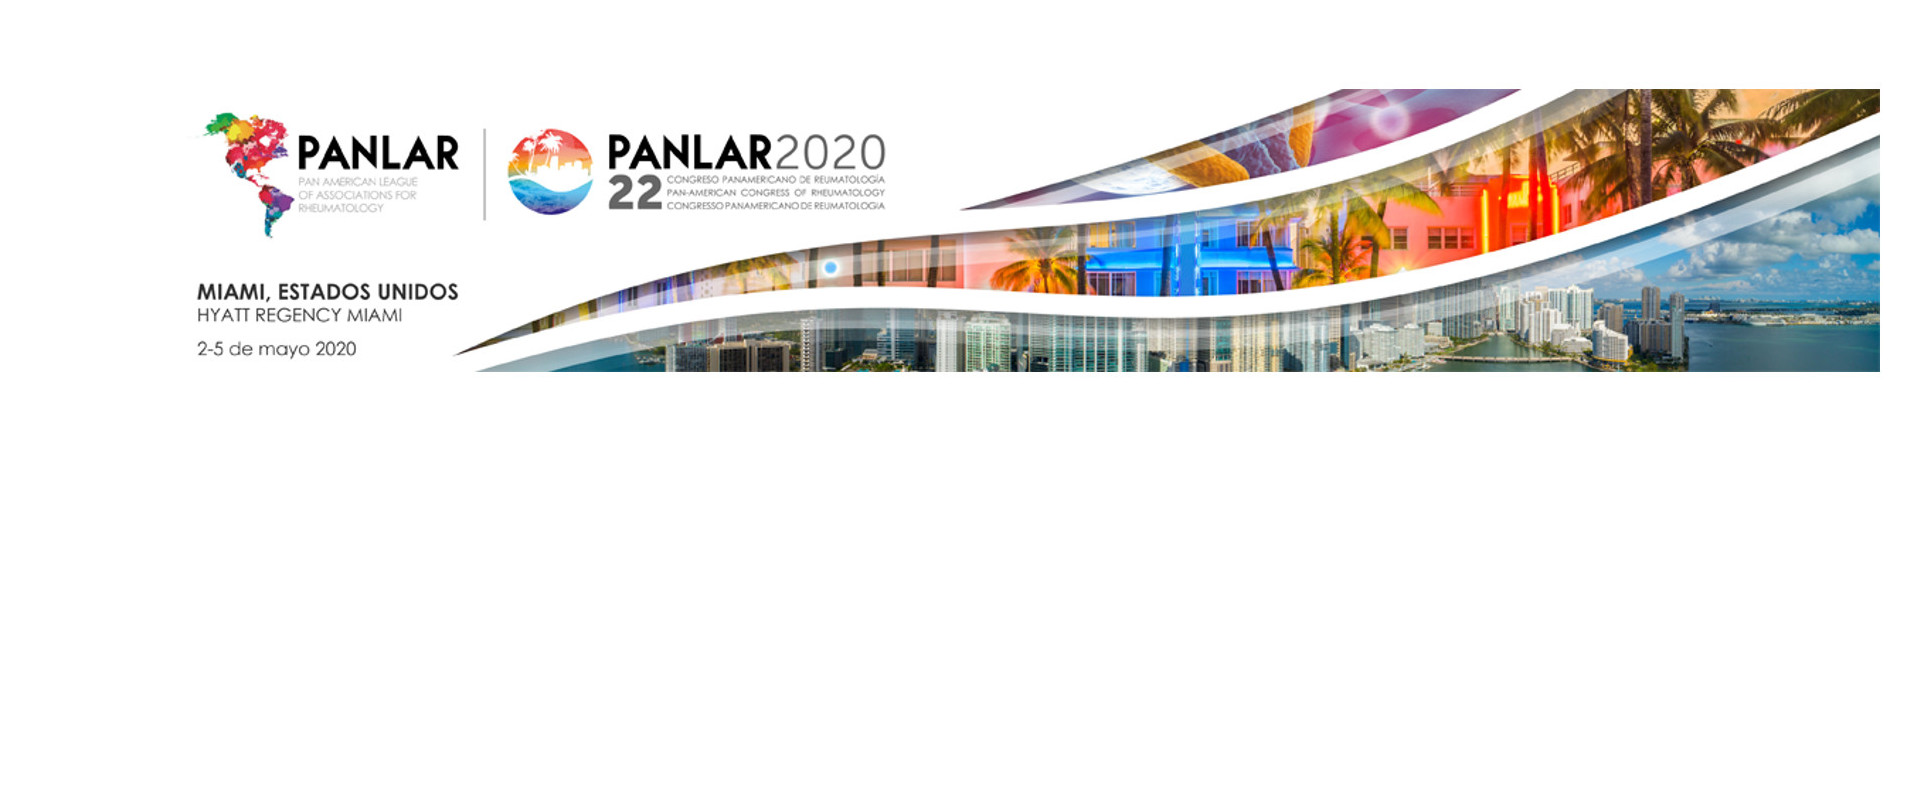 PANLAR 2020